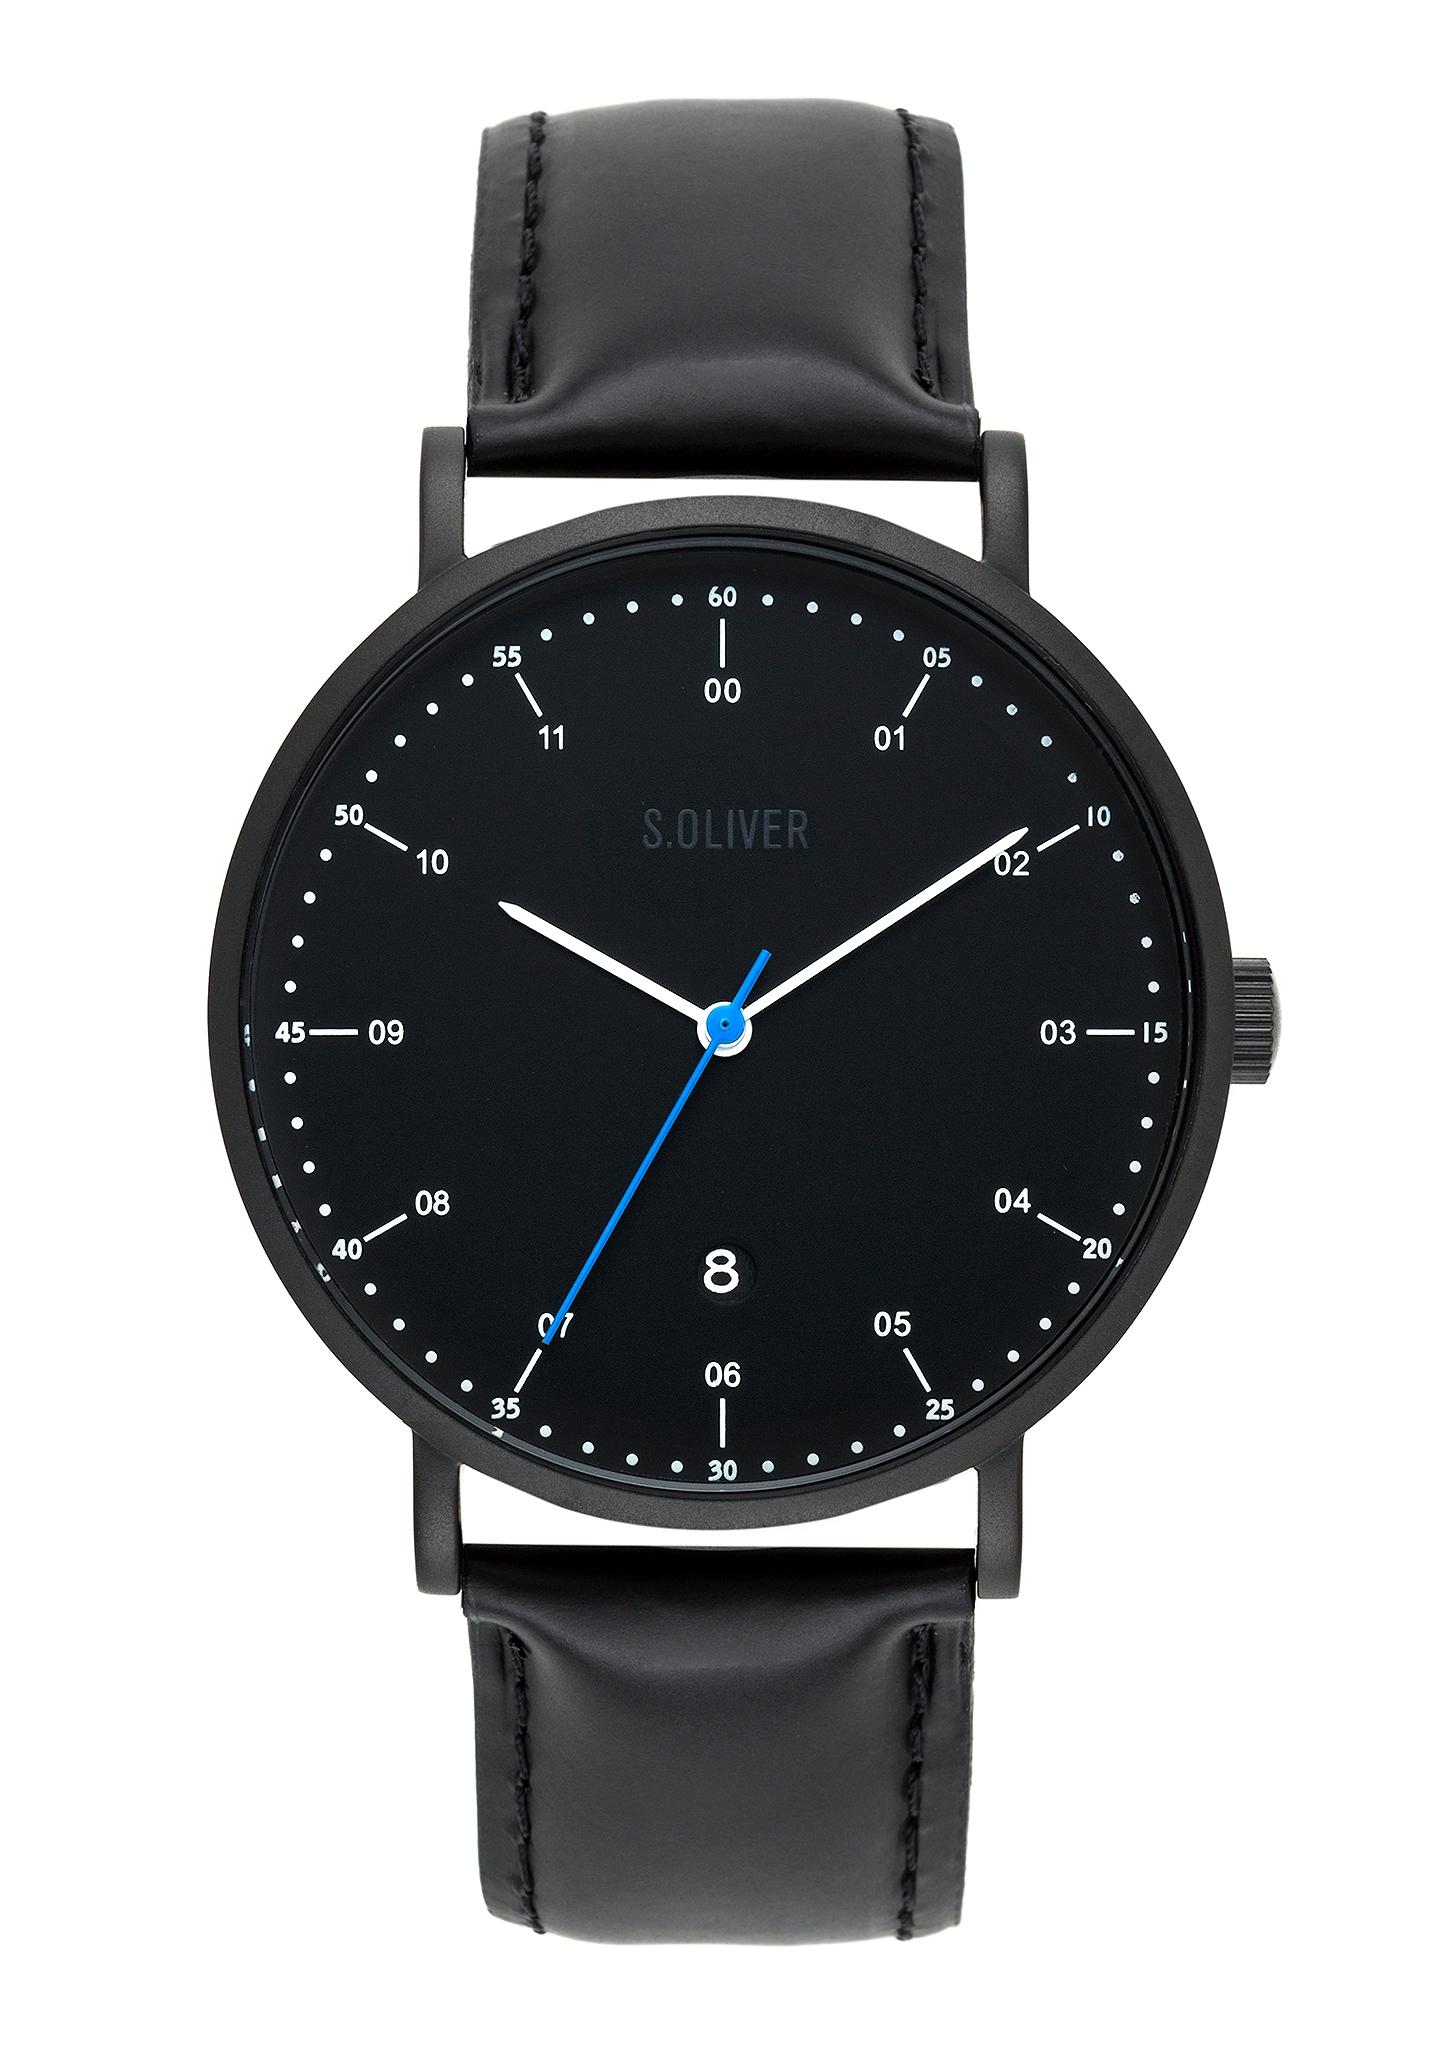 Armbanduhr | Uhren | Grau/schwarz | Mineralglas - Echtleder -  edelstahl | s.Oliver